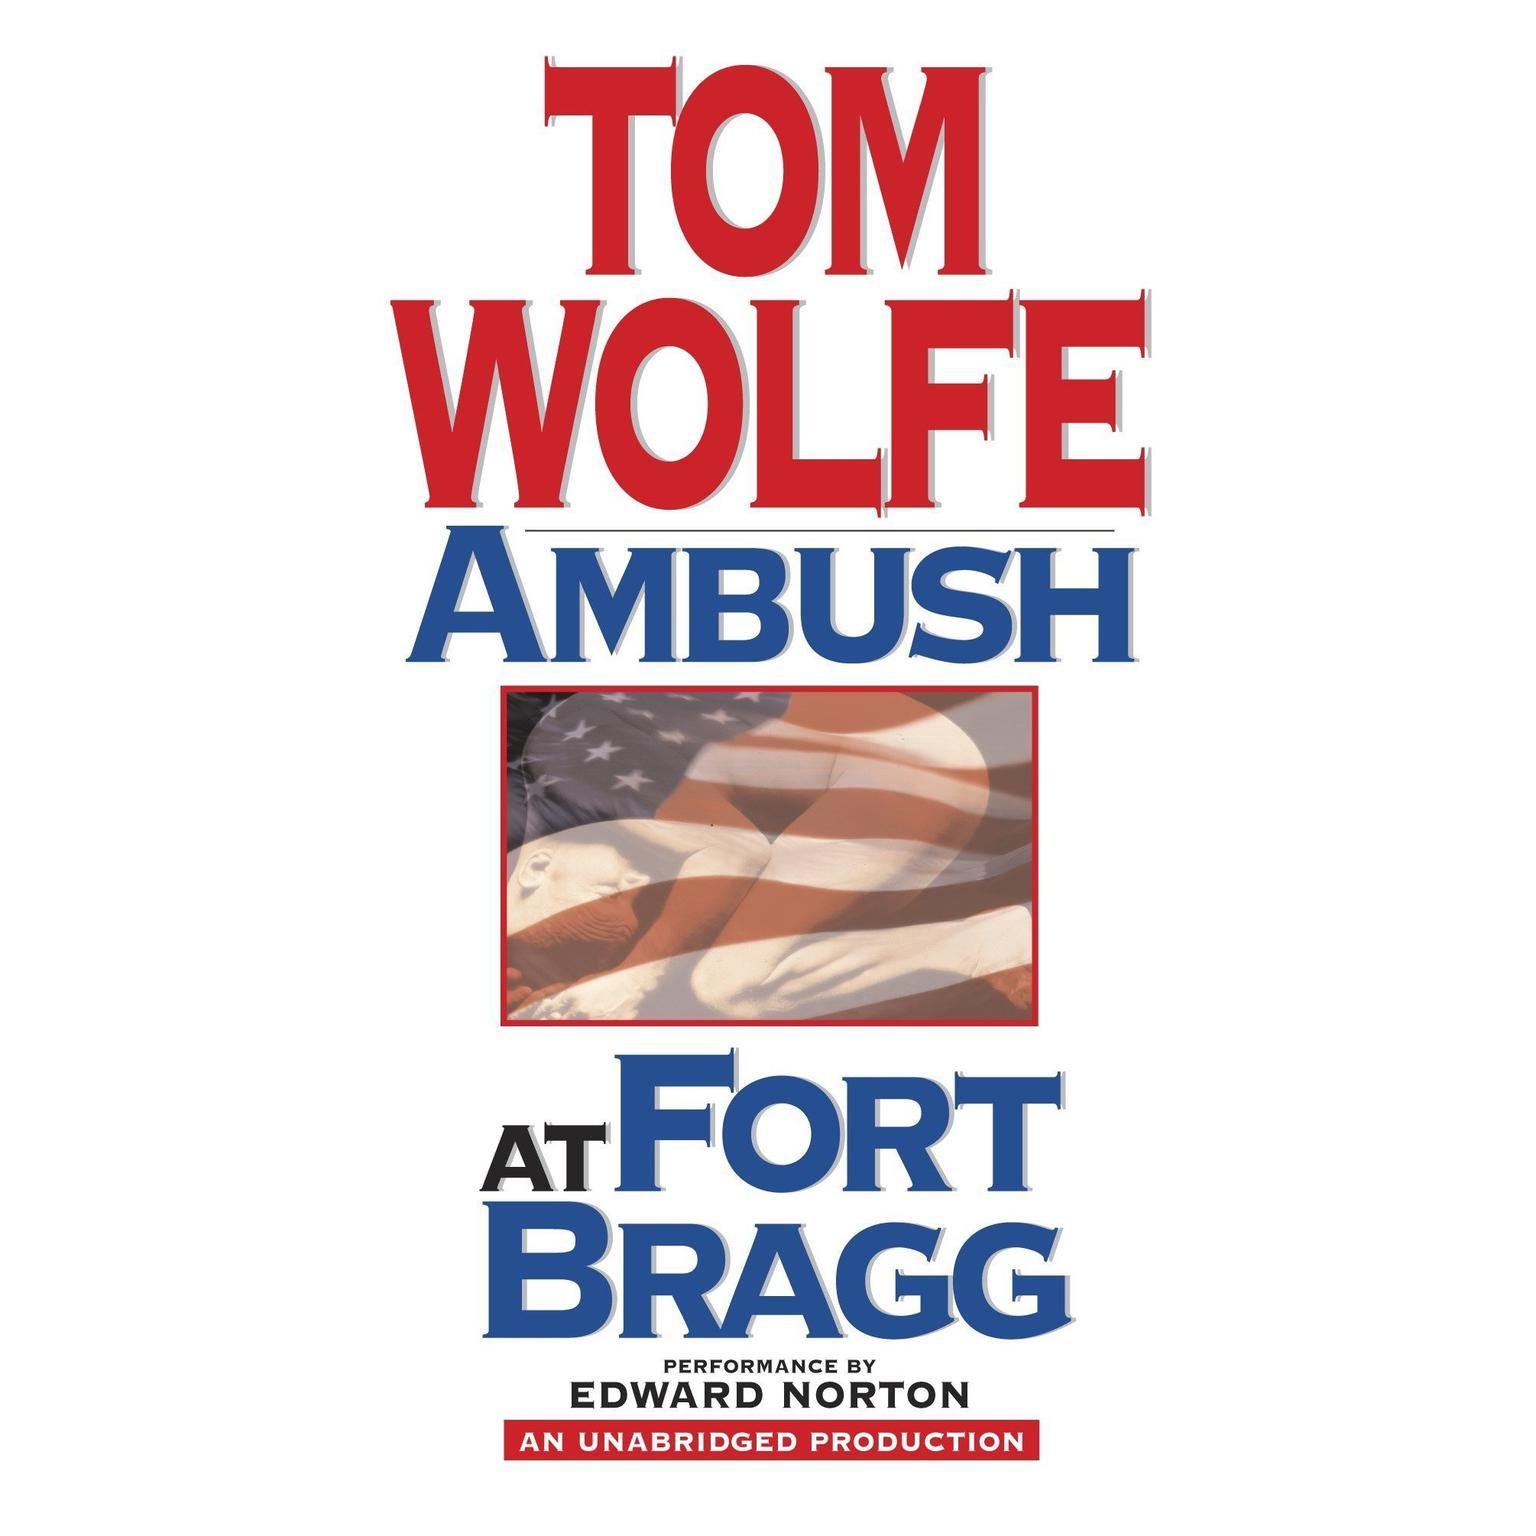 Ambush at Fort Bragg Audiobook, by Tom Wolfe